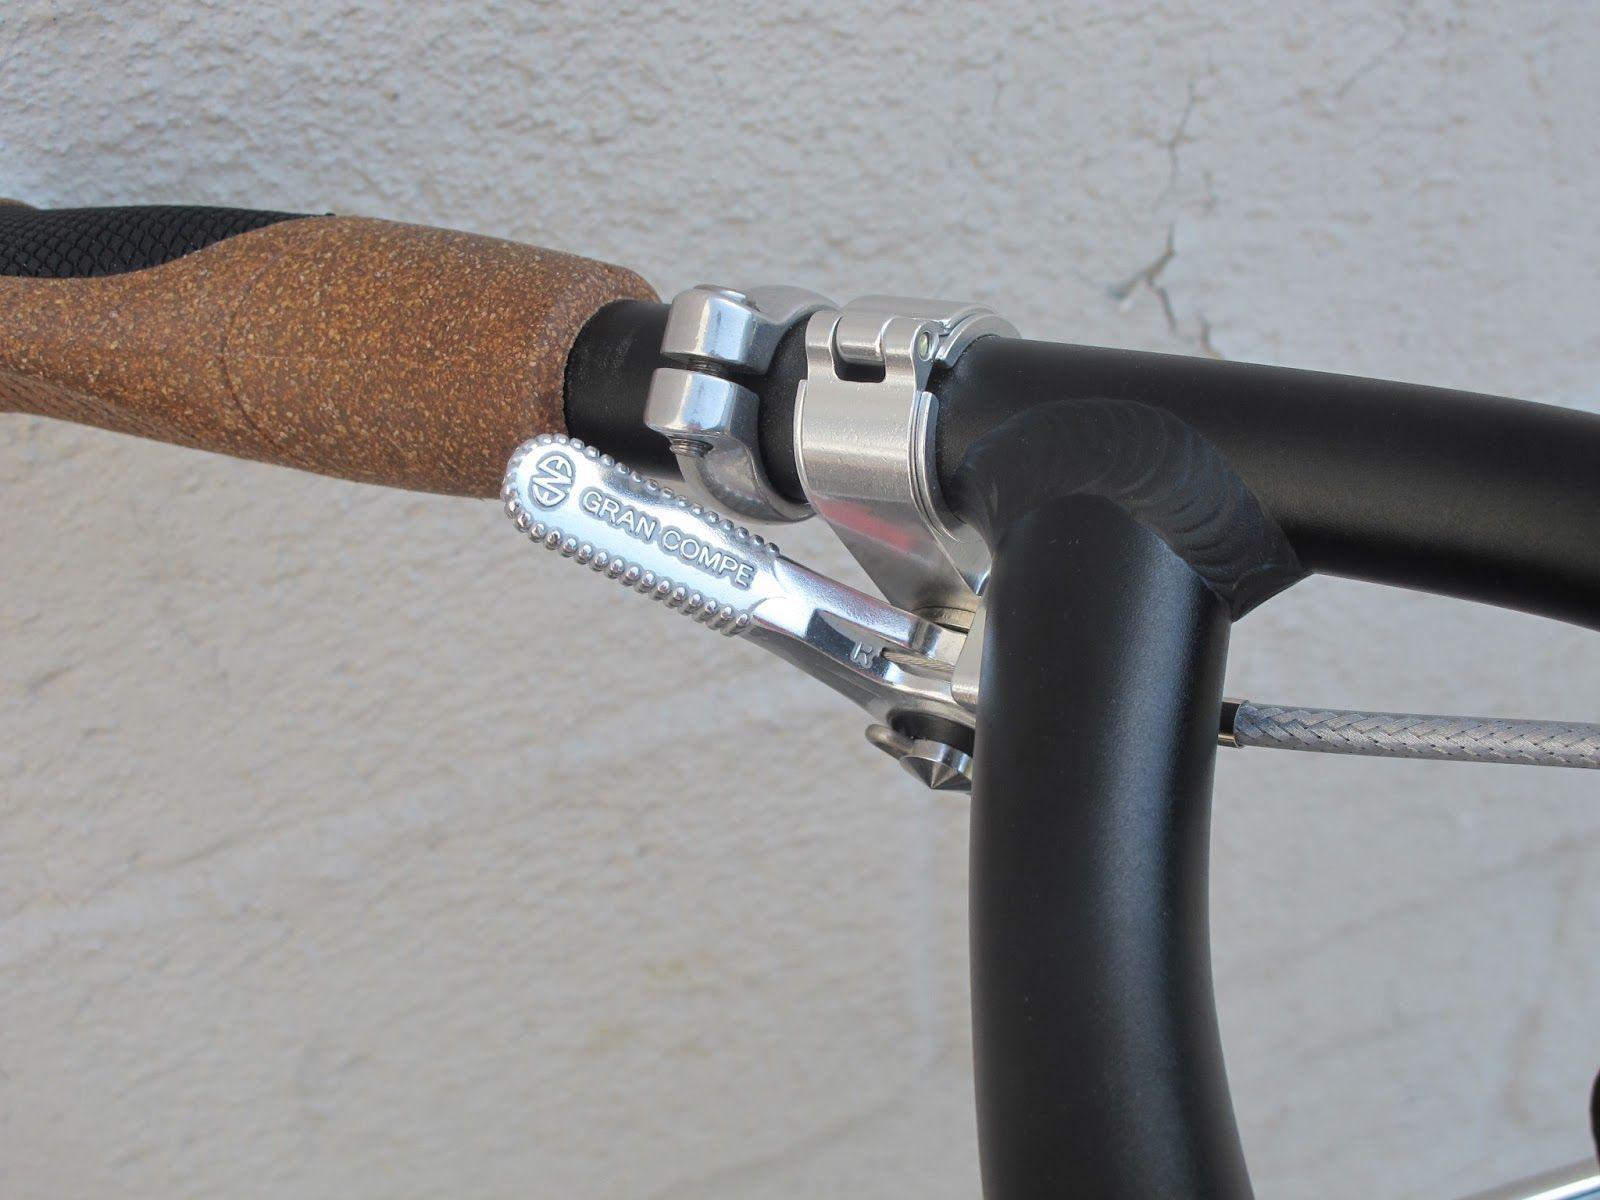 Vintage Classic Retro Thumb Shifter Handlebar Mounts